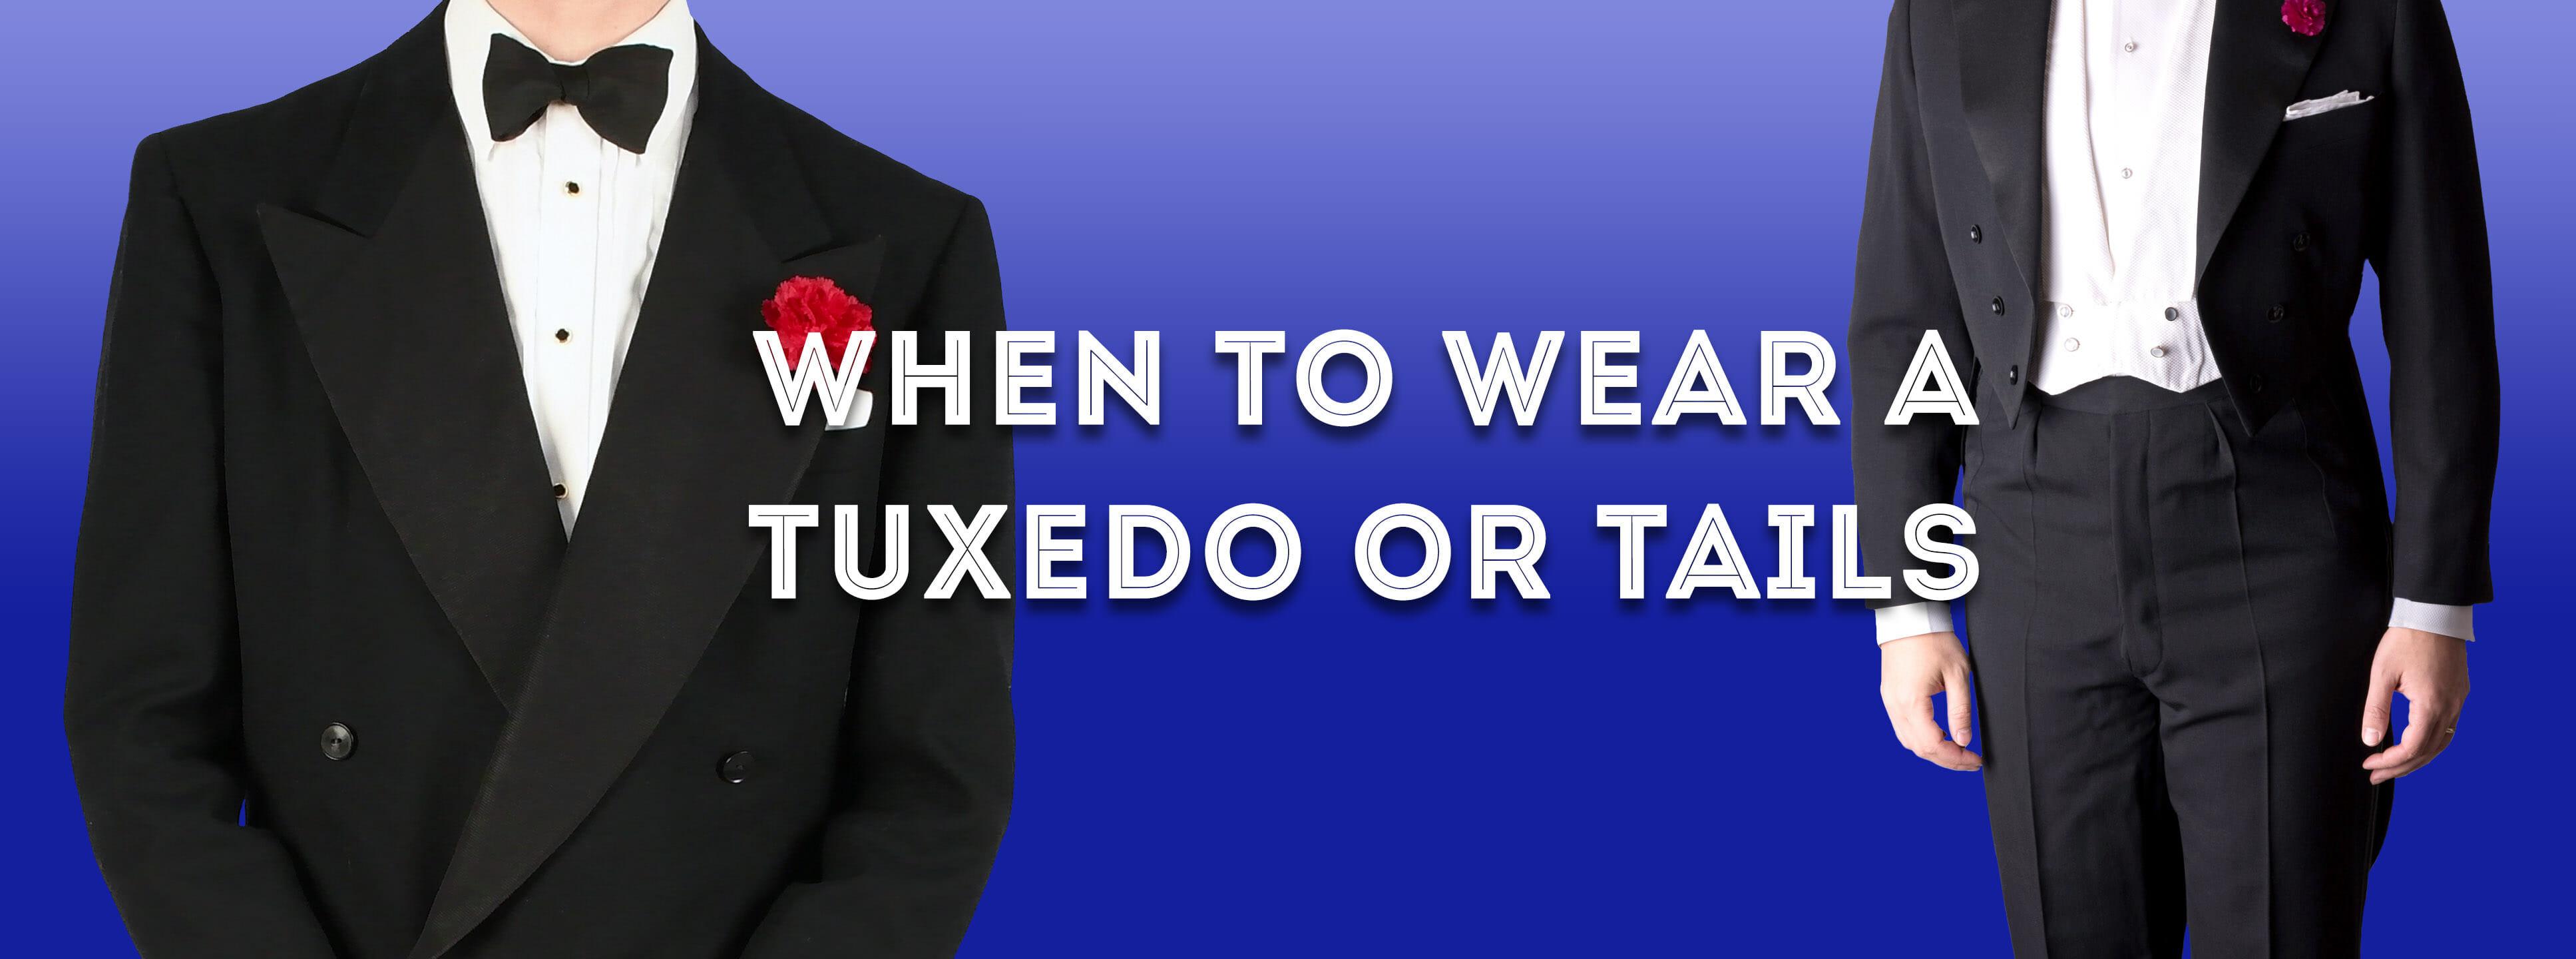 DINNER DRESS TUX TUXEDO SHIRT BOW TIE BOWTIE SET 14 15 16 17 18  CRUISE SHIRTS